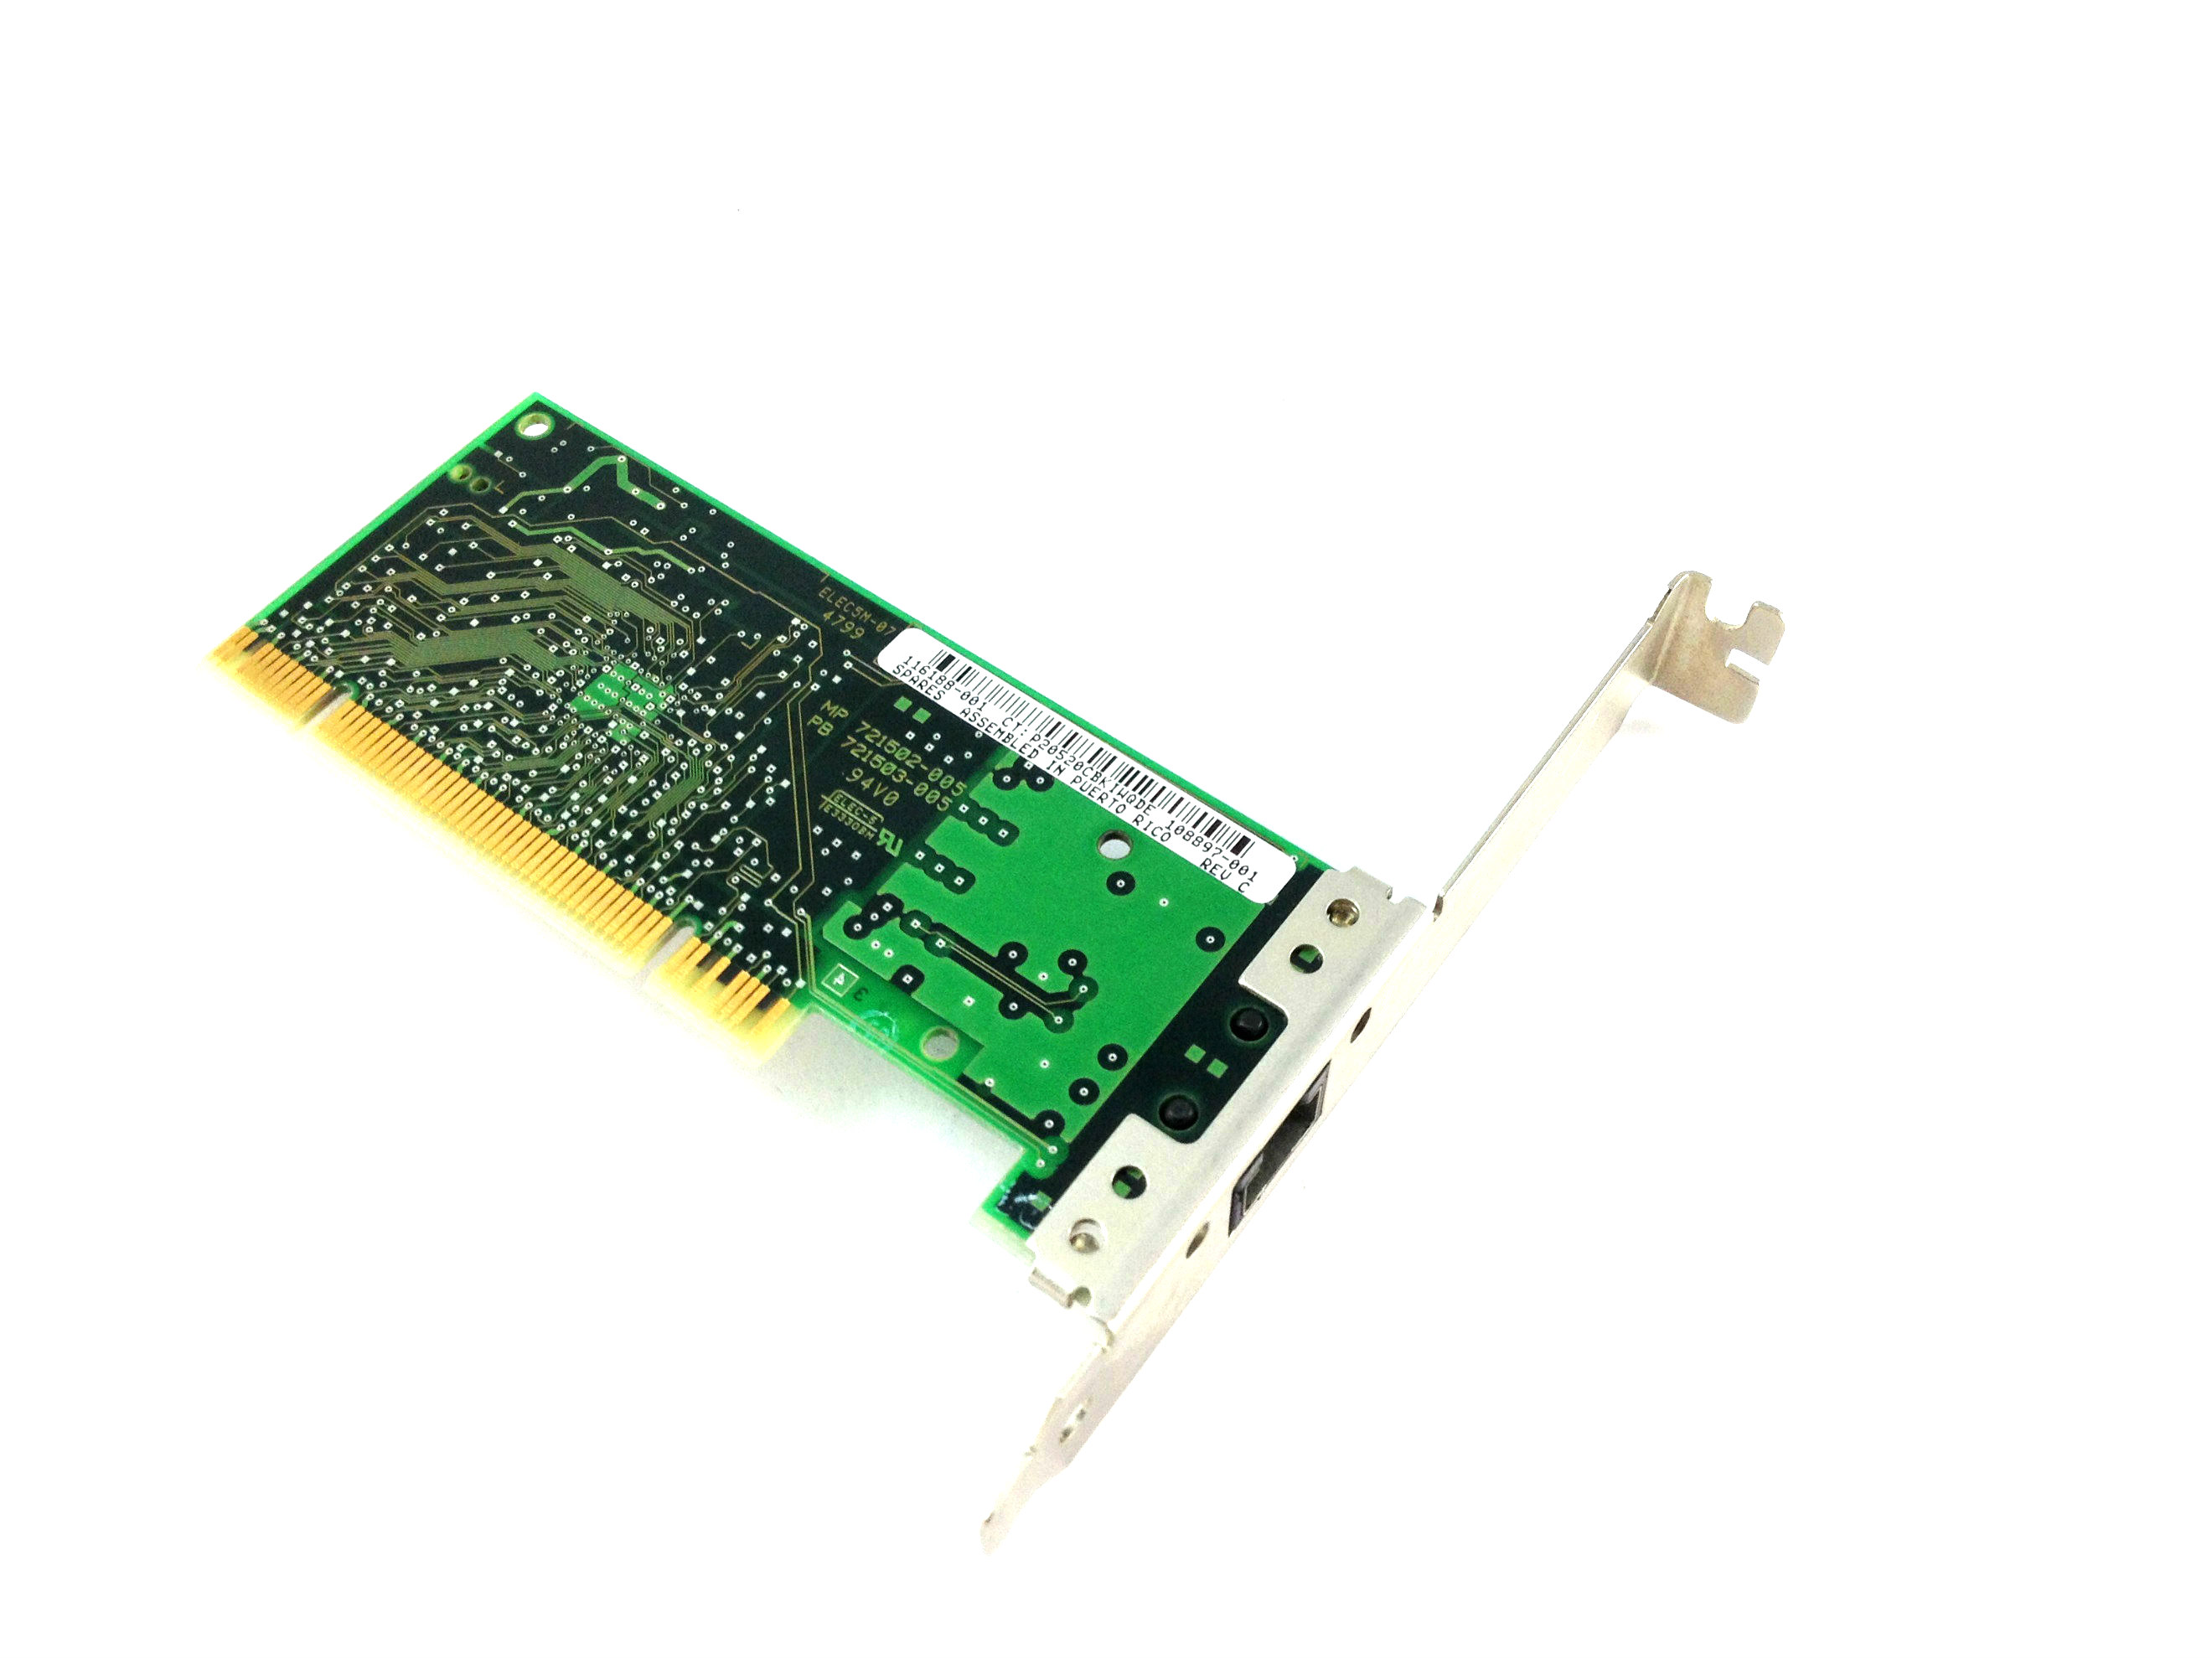 Compaq 108897-001 Revision C Network Card 116188-001 (116188-001)